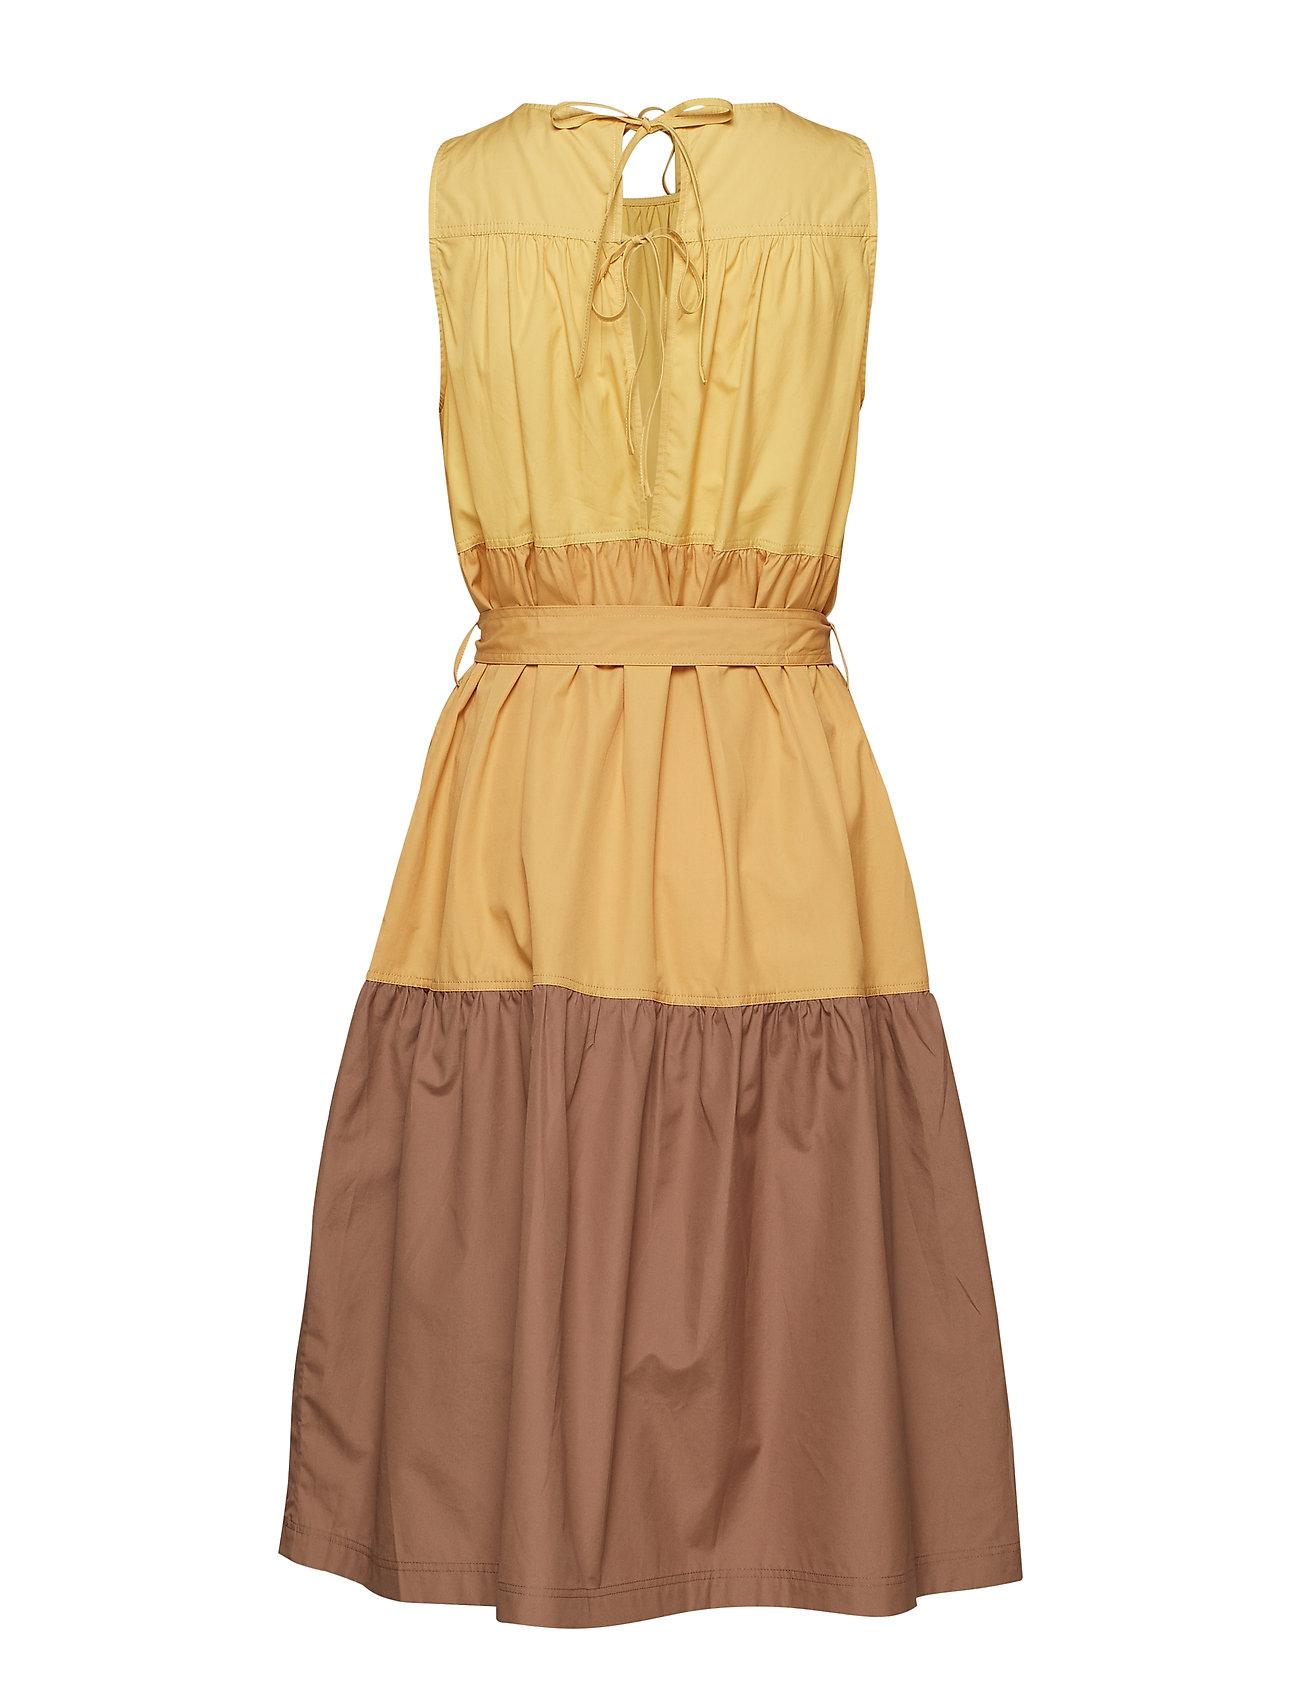 YellowNoa Dress Short YellowNoa Short Dress Sleeveart Dress Sleeveart Short Sleeveart uZwPkOTXi